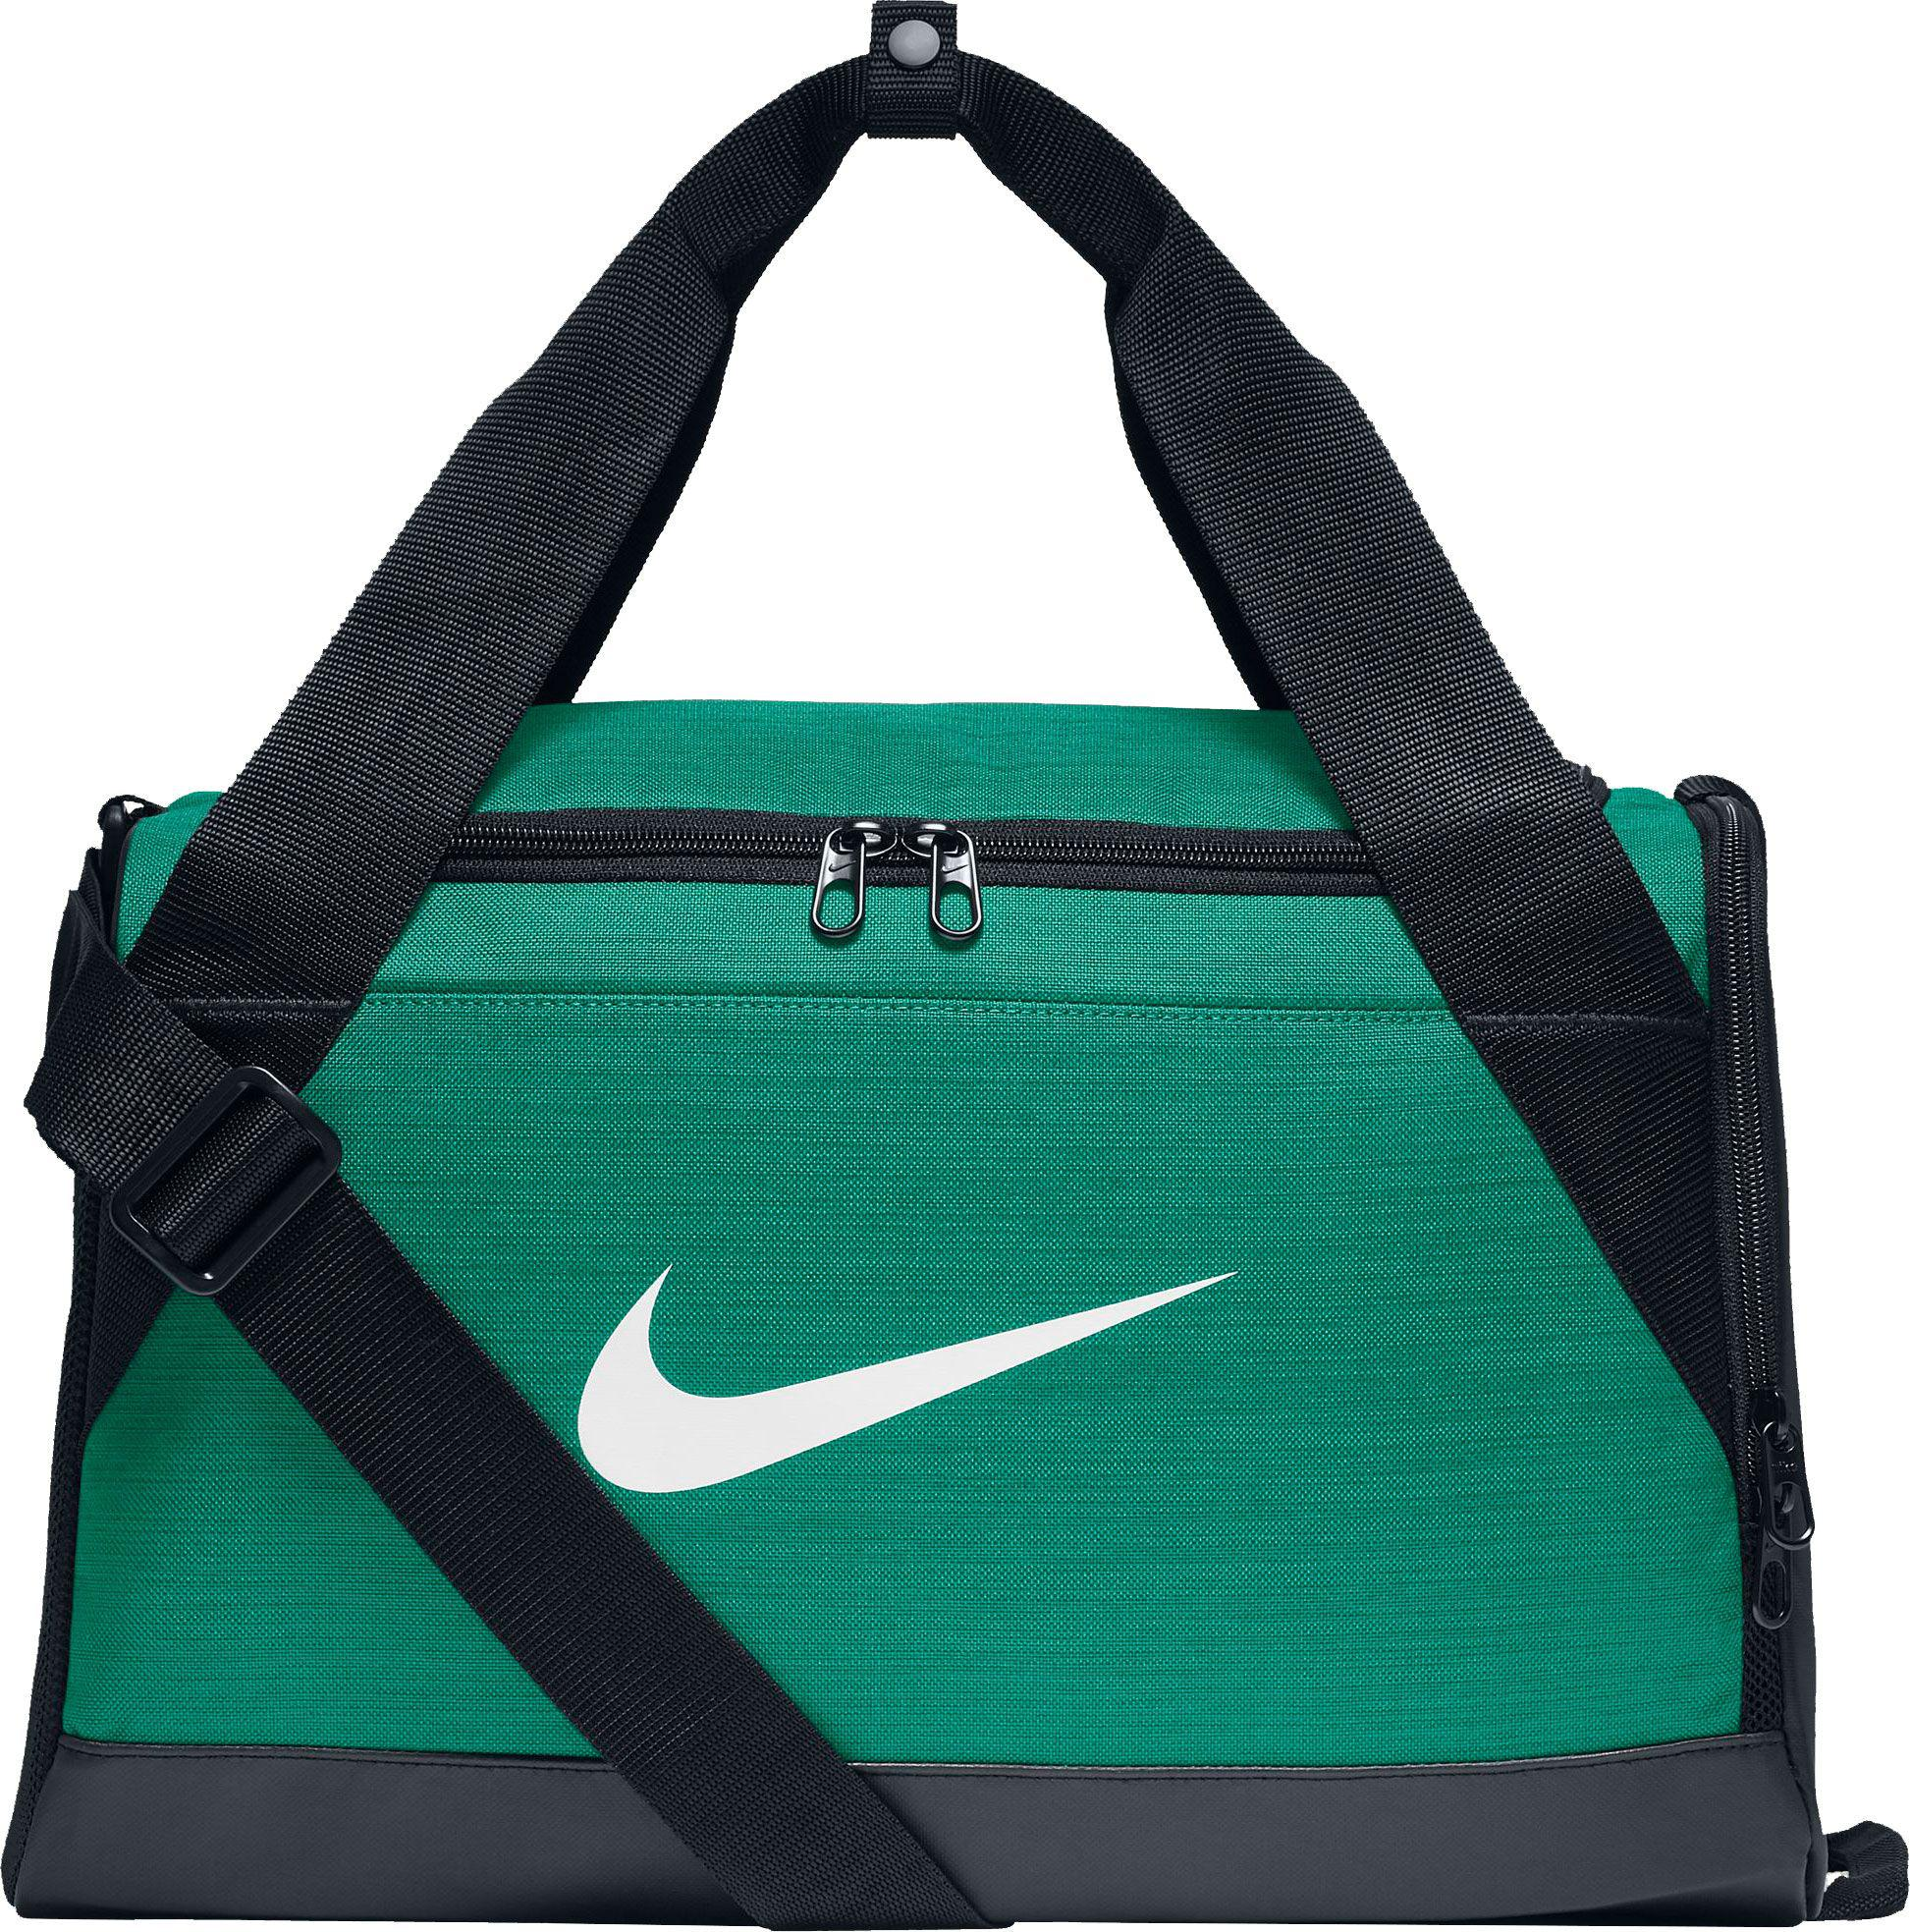 d2896e92c Nike Rasilia 8 X-small Duffle Bag in Green - Lyst